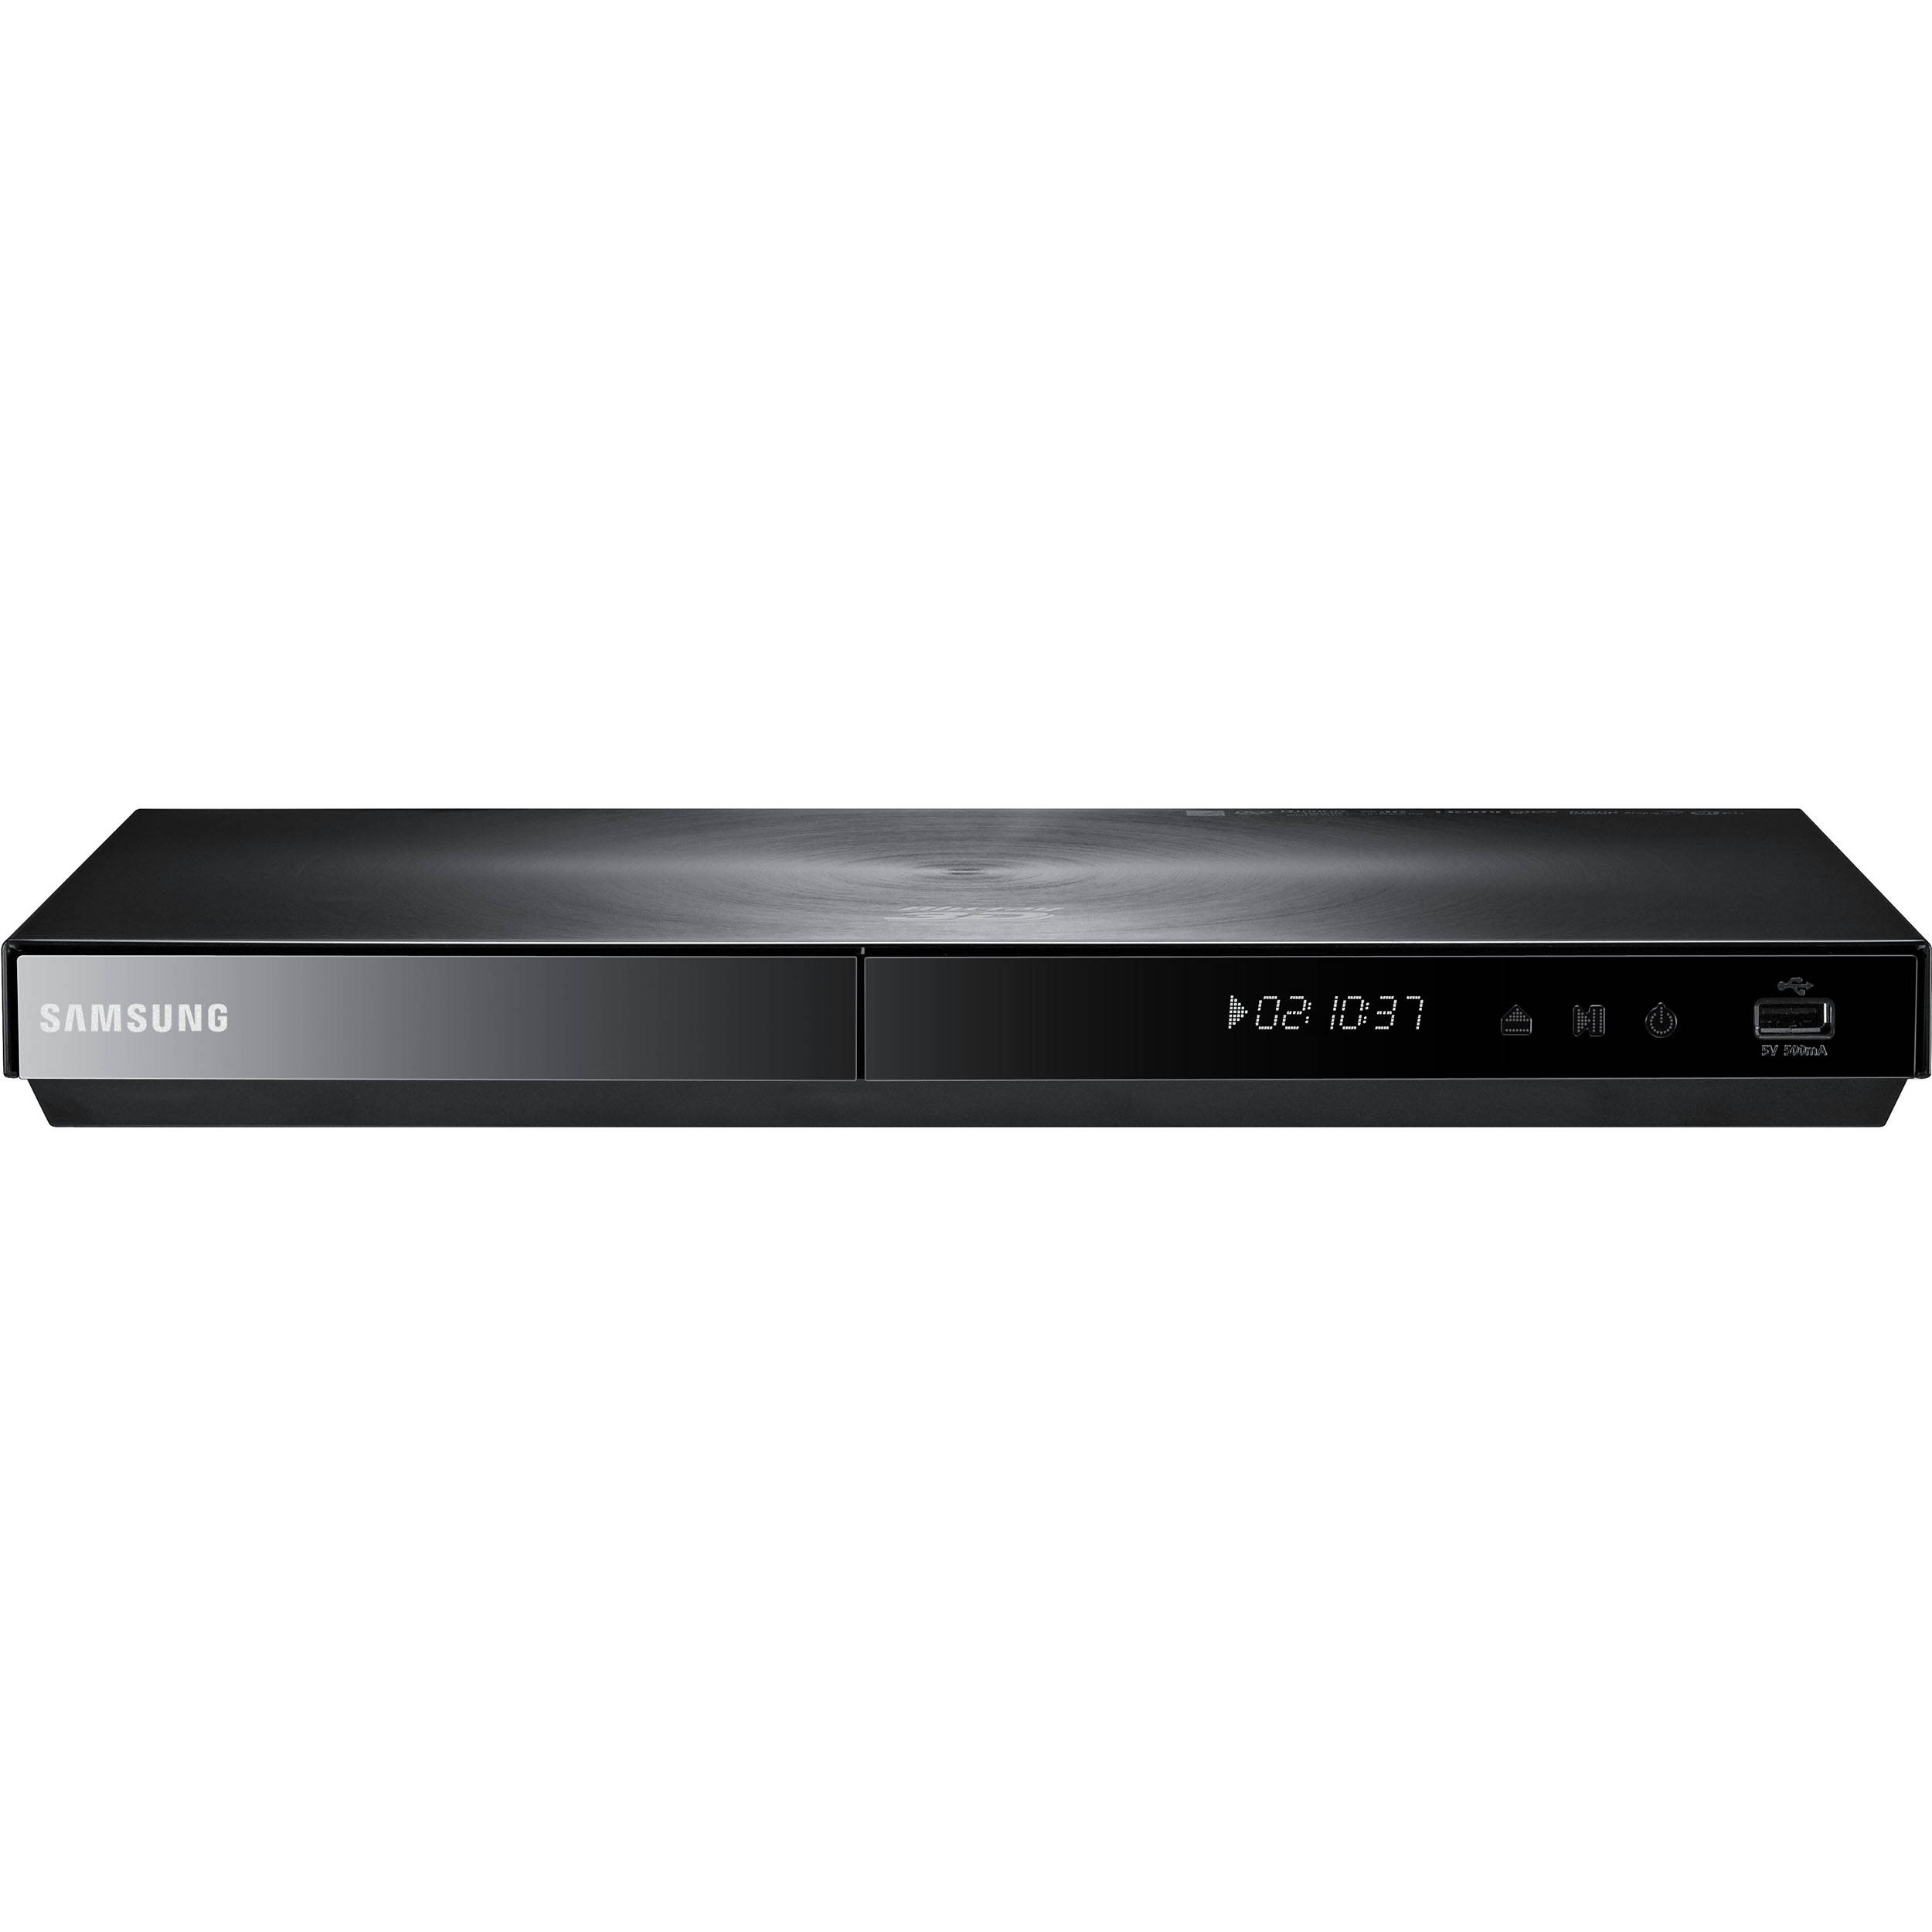 samsung bd e5900 blu ray disc player bd e5900 b h photo video. Black Bedroom Furniture Sets. Home Design Ideas